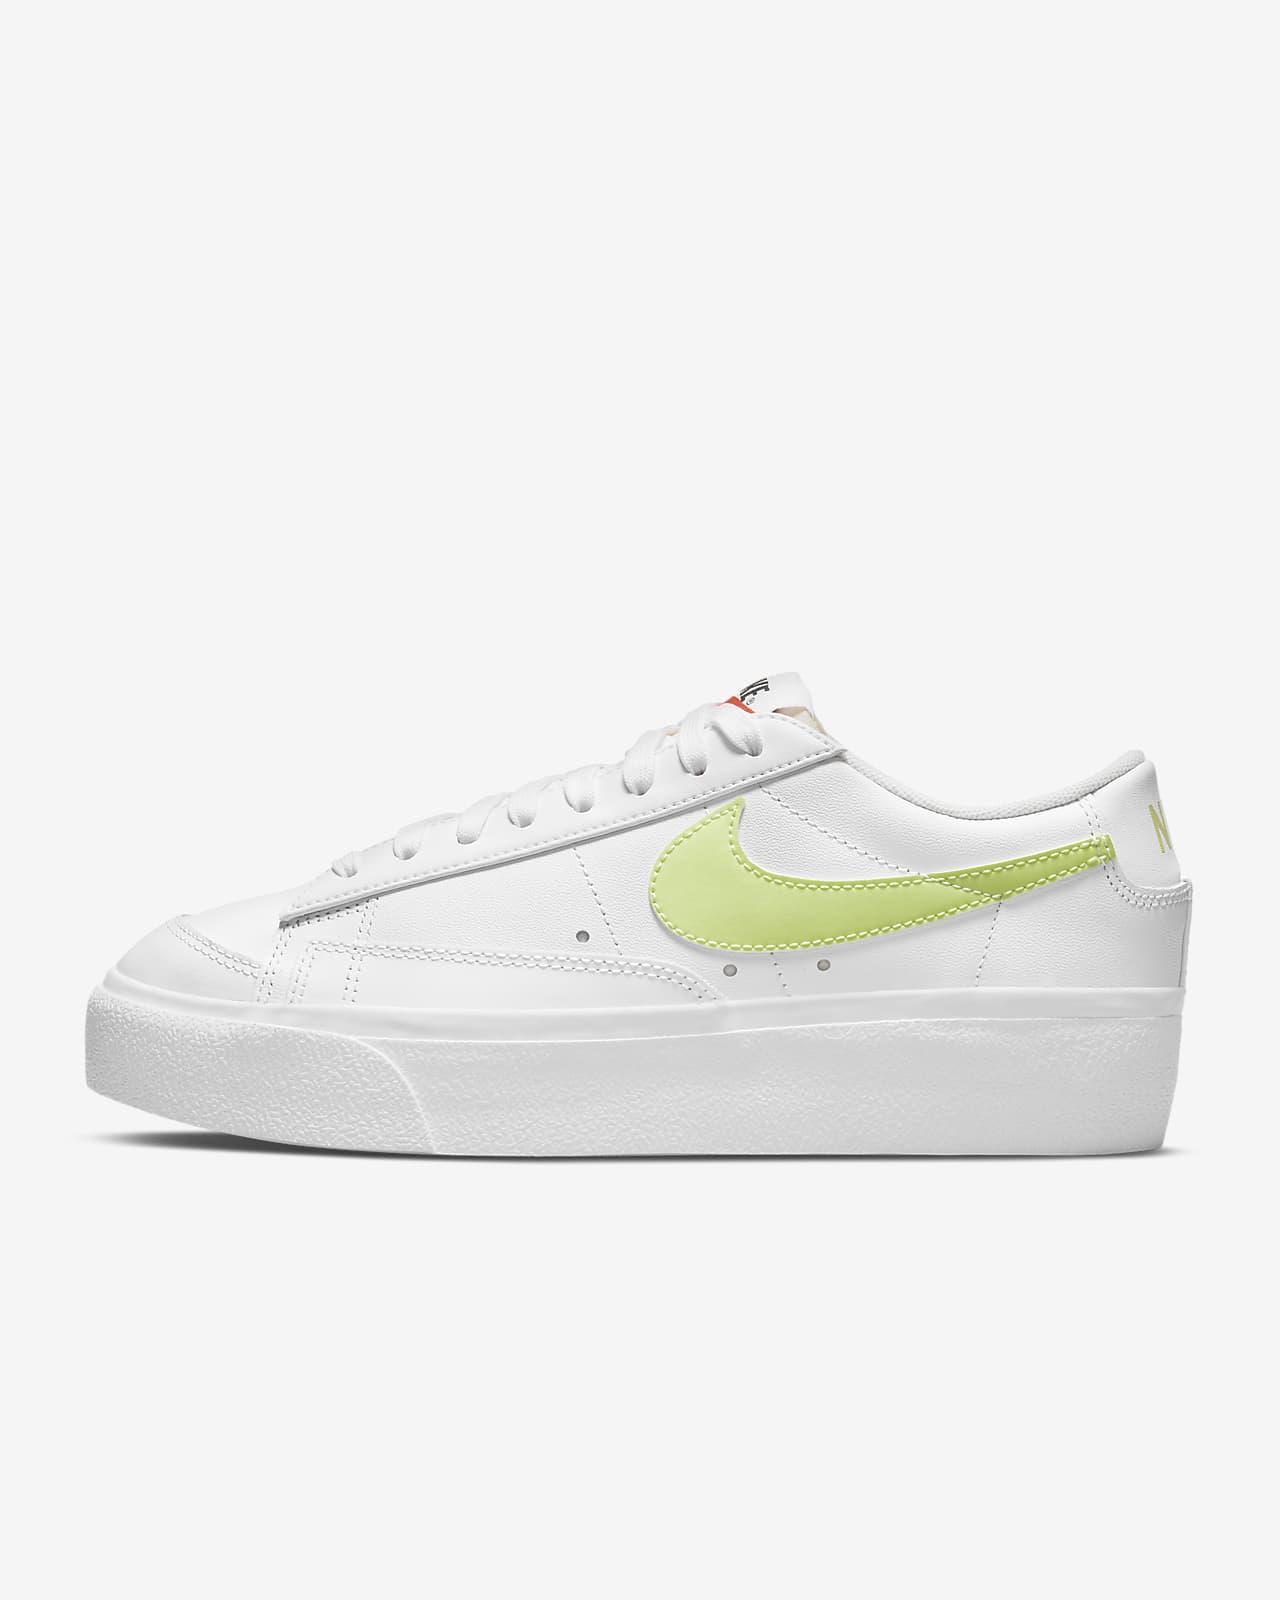 Chaussures Nike Blazer Low Platform pour Femme